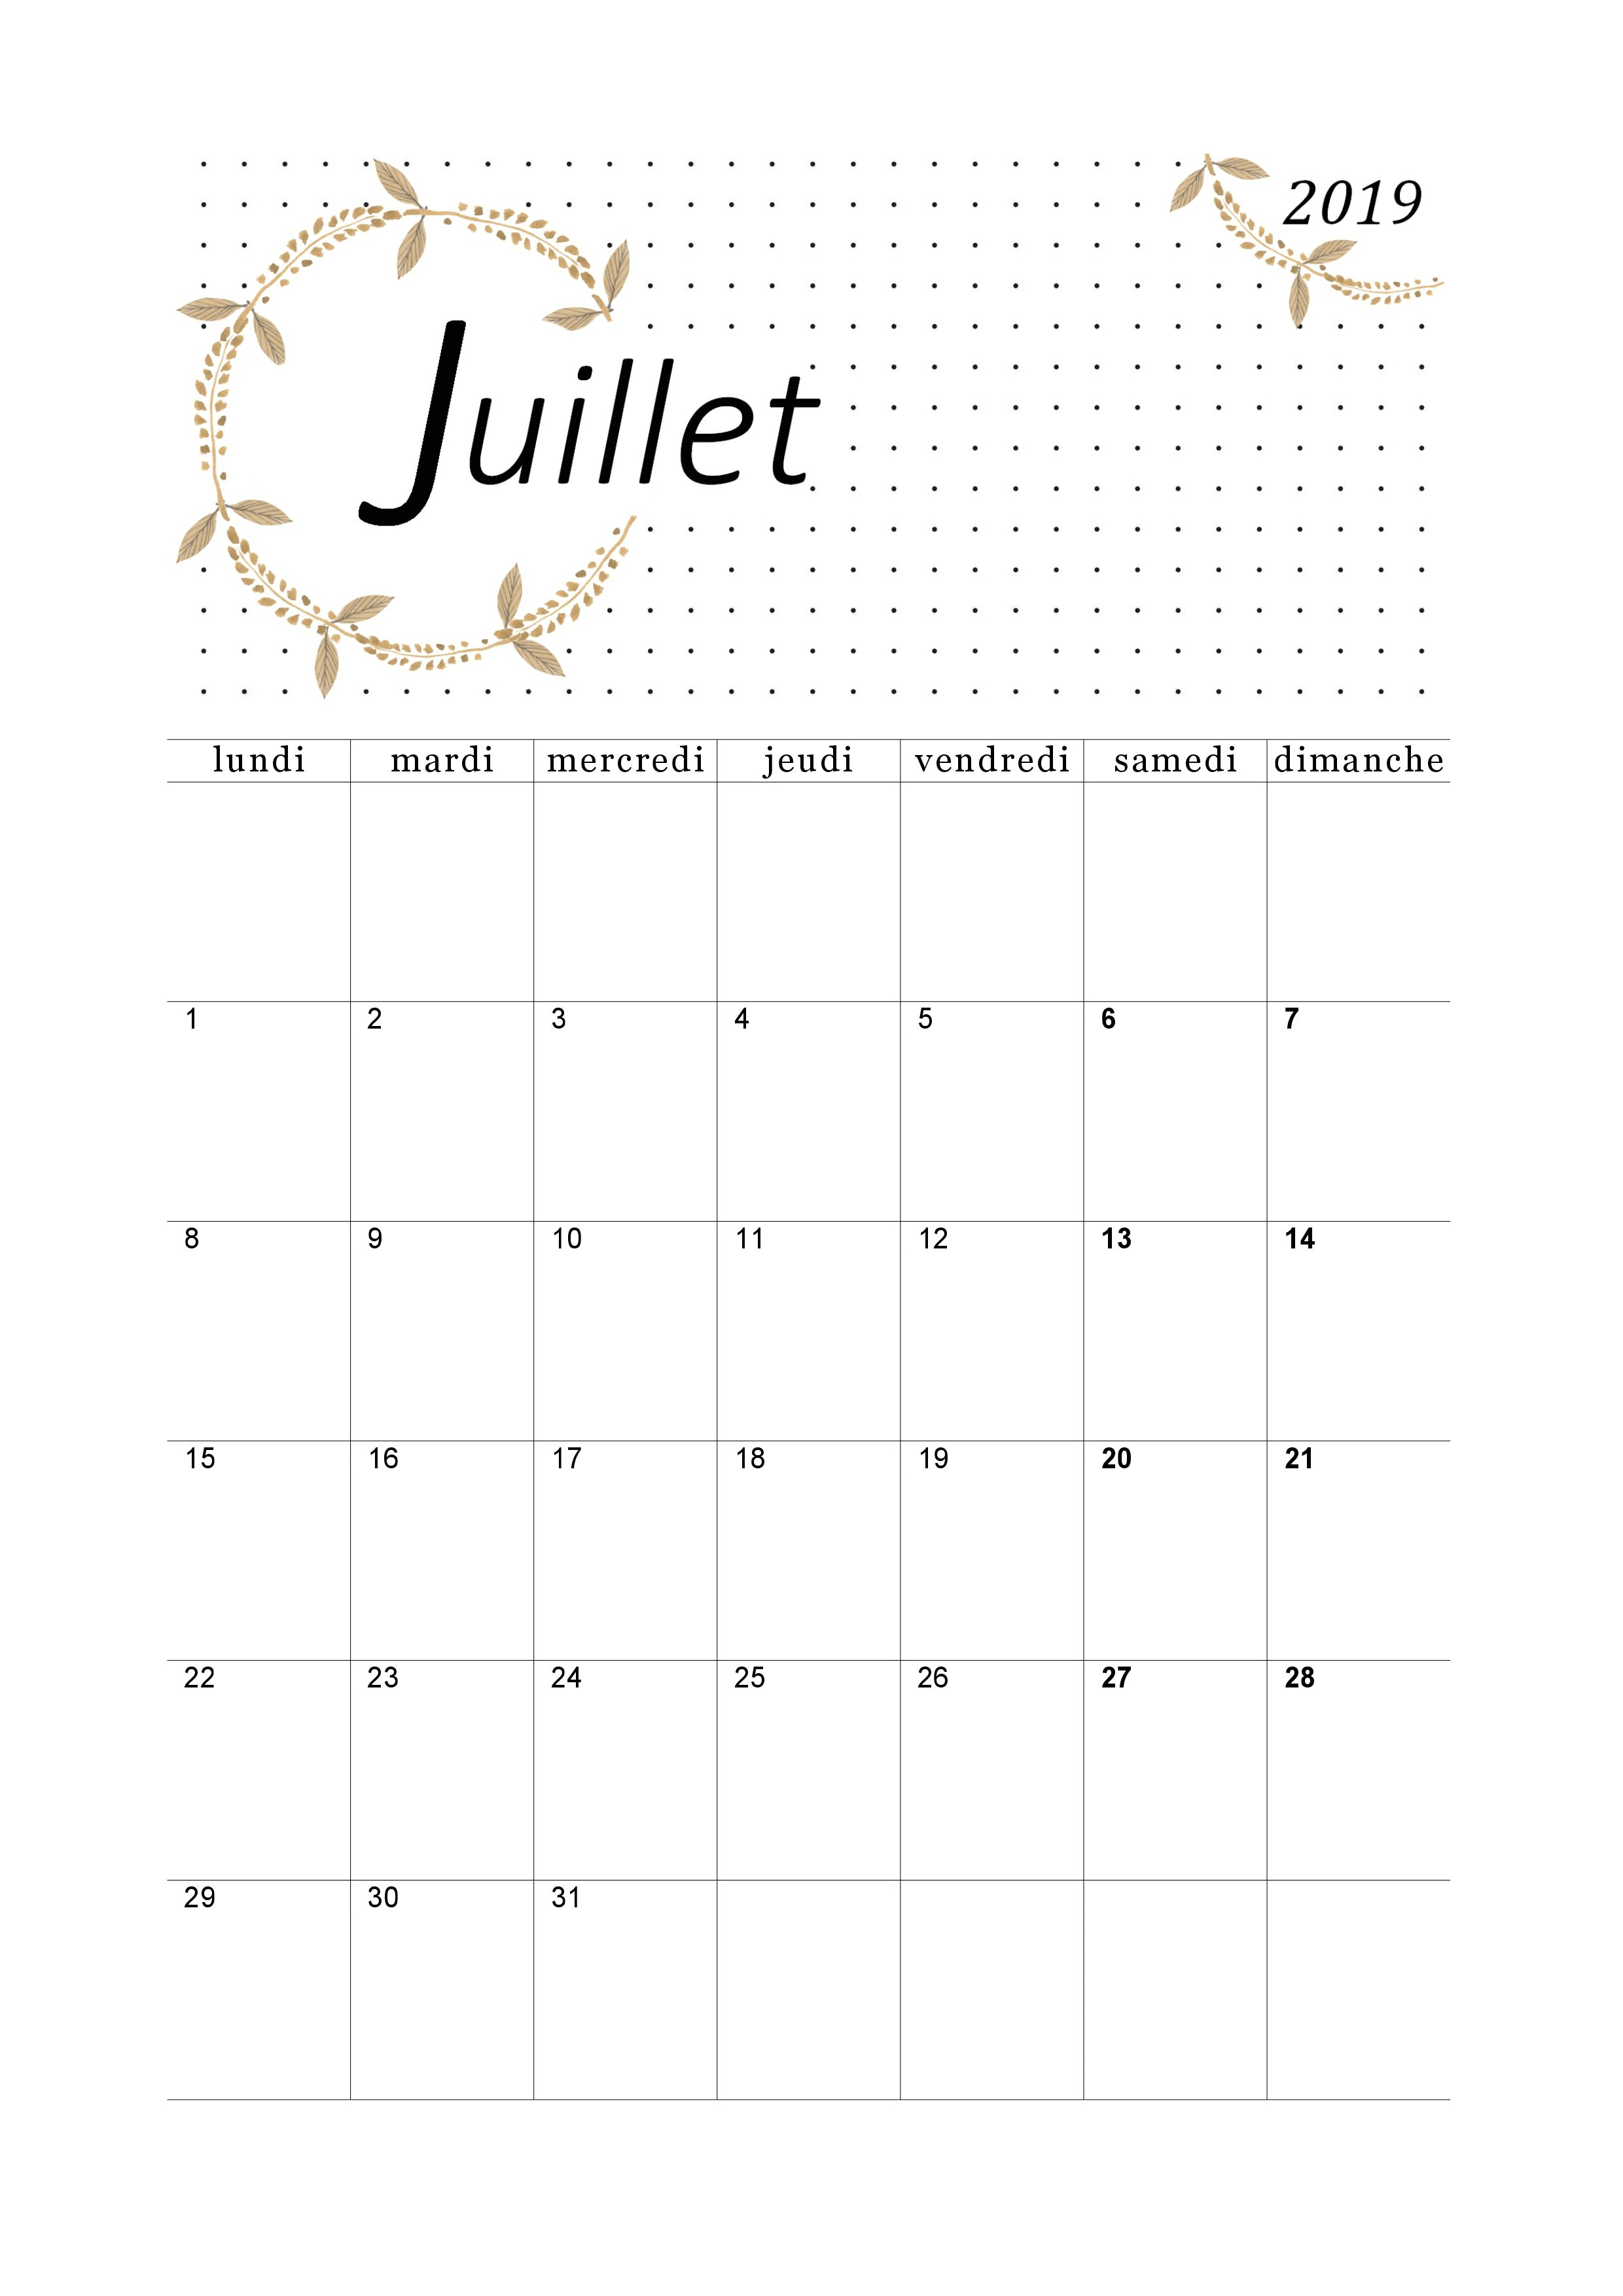 Calendrier A Imprimer Juillet 2019.Calendrier Juillet 2019 A Imprimer Calendriers Imprimables